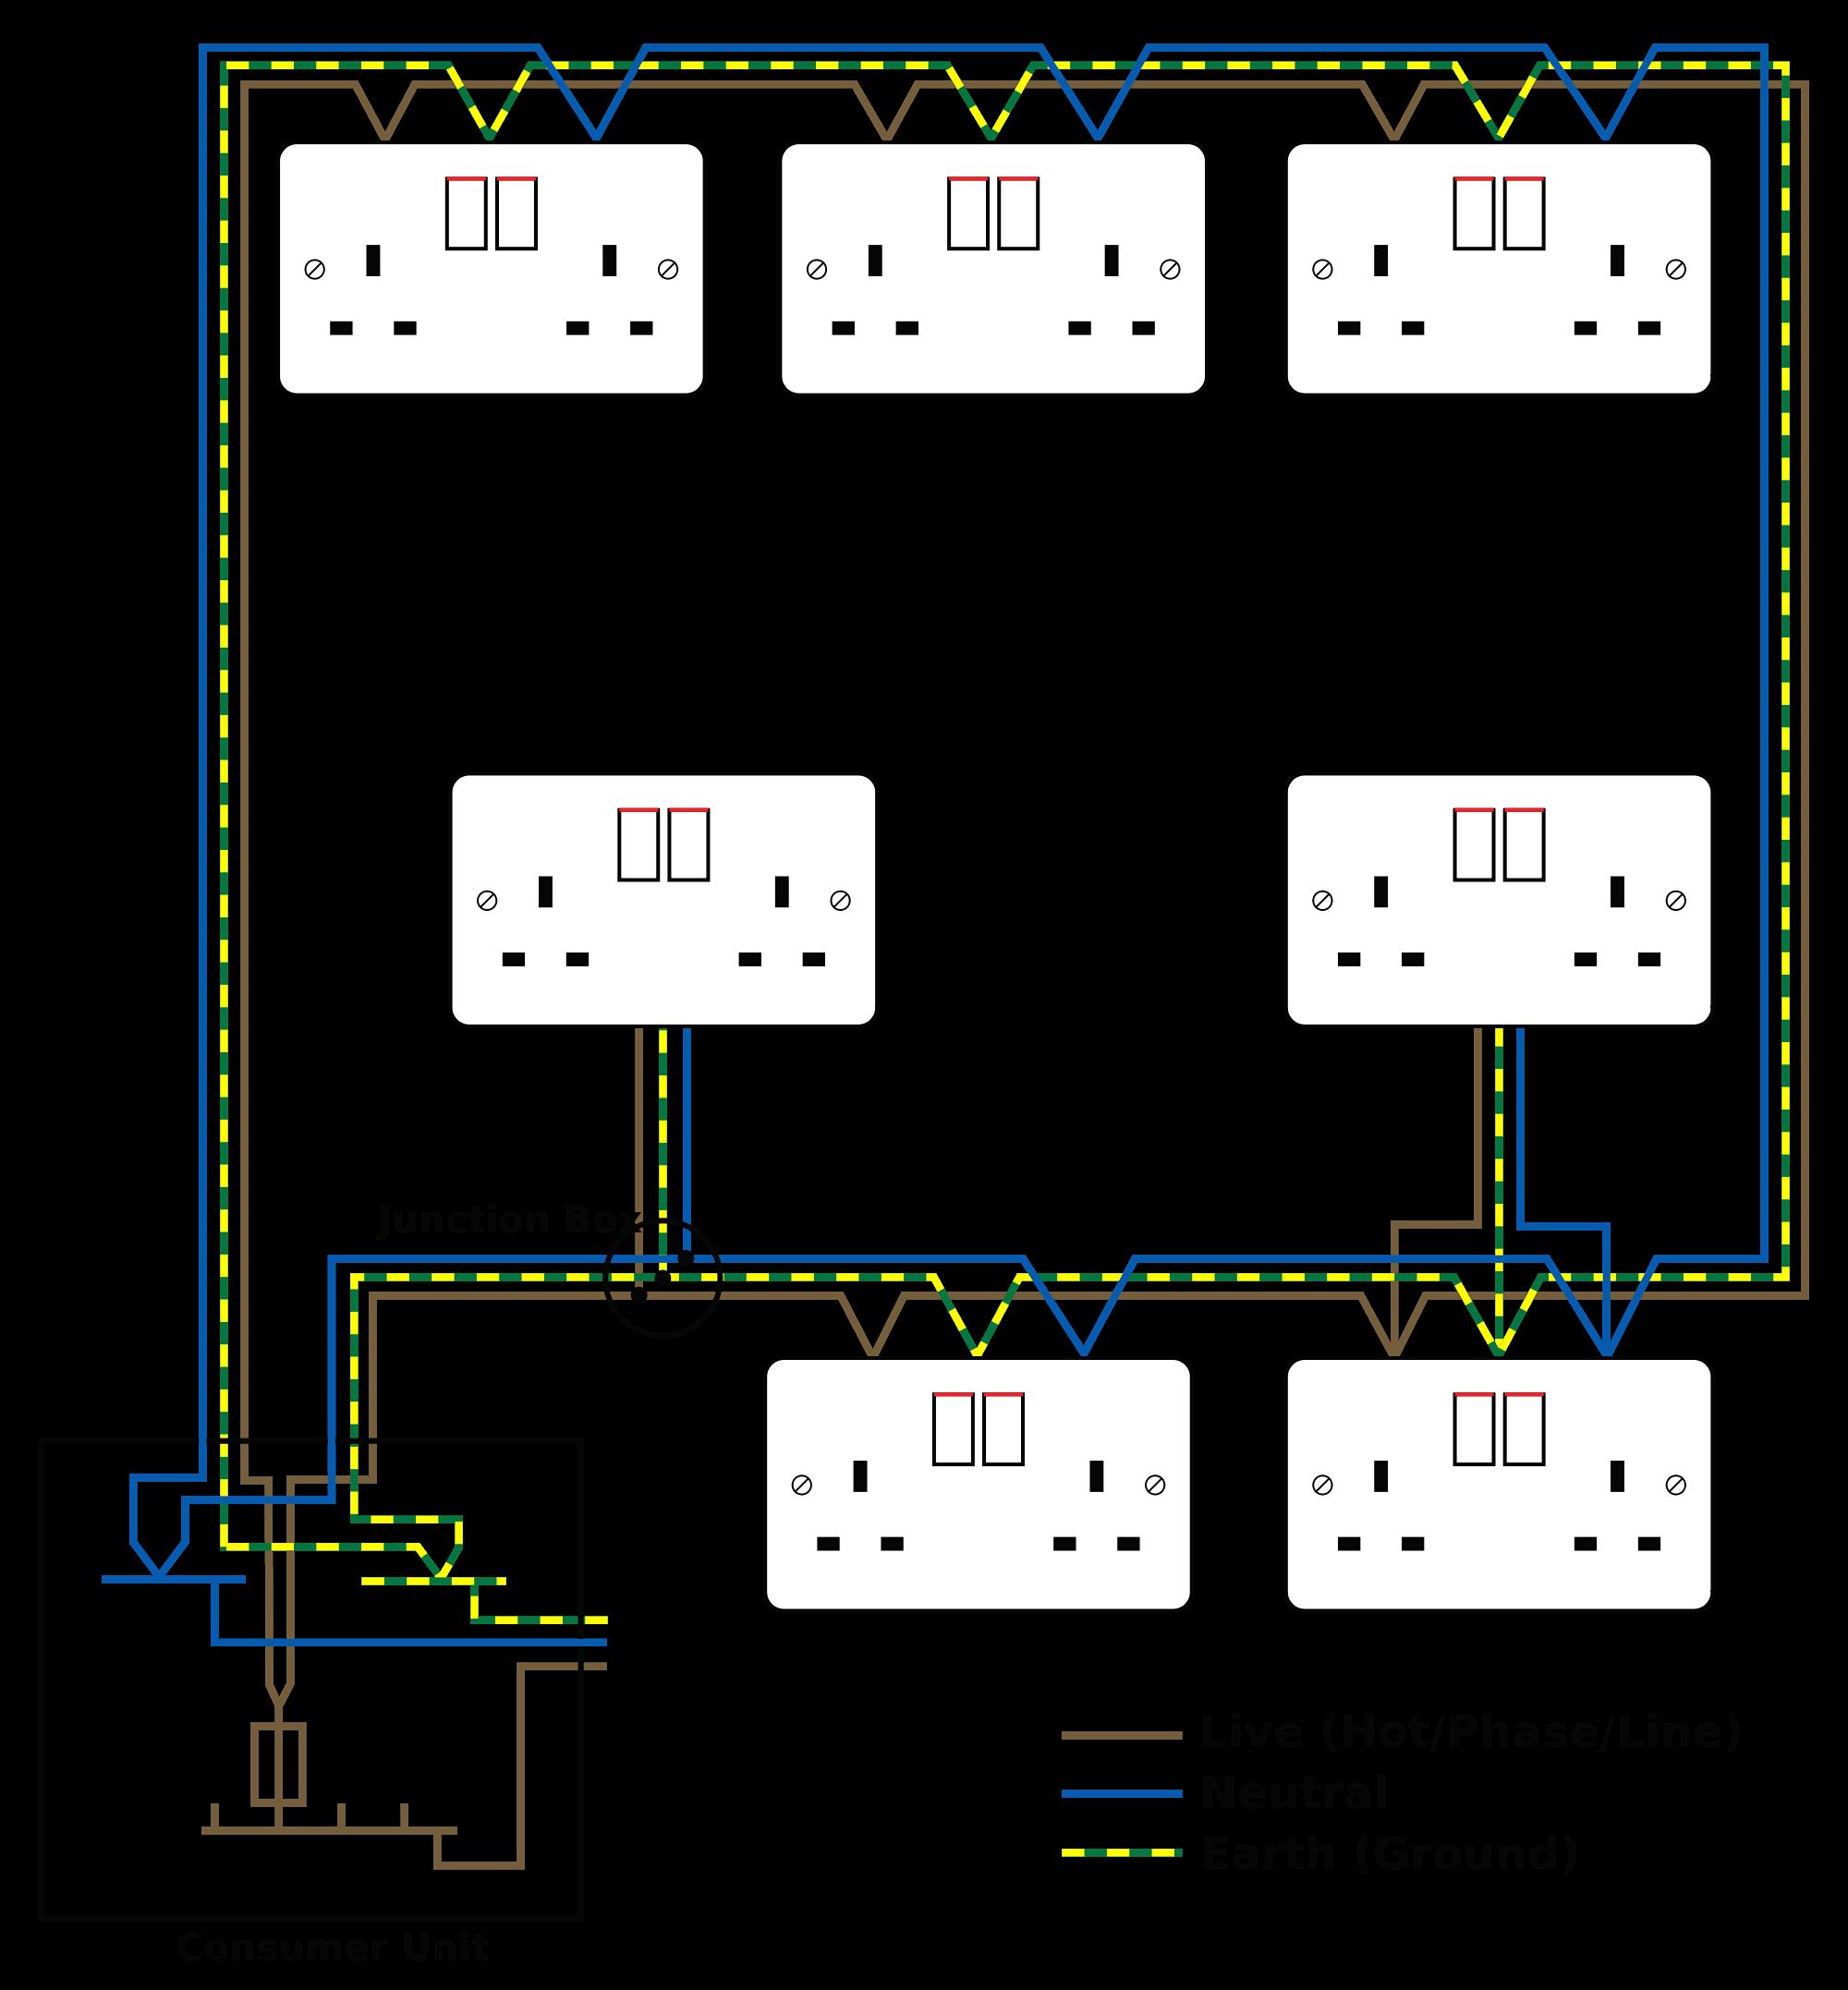 medium resolution of new wiring diagram for house lighting circuit pdf diagram diagramsample diagramtemplate wiringdiagram